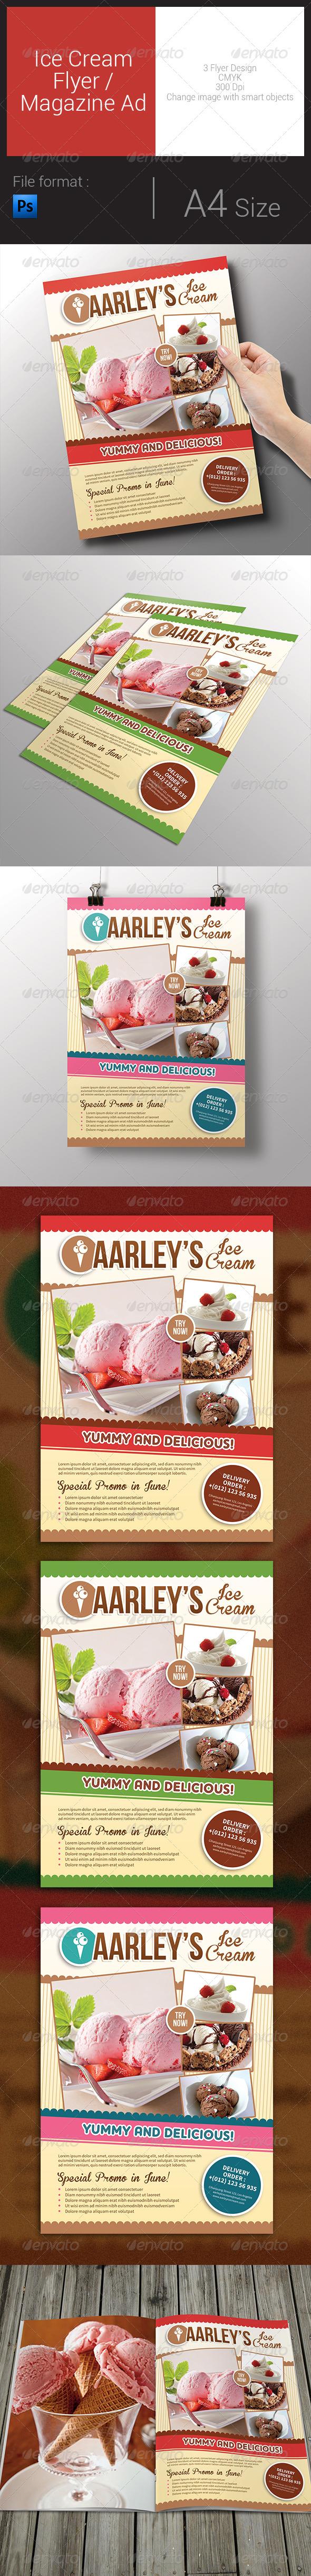 GraphicRiver Ice Cream Flyer Magazine Ad 8016828